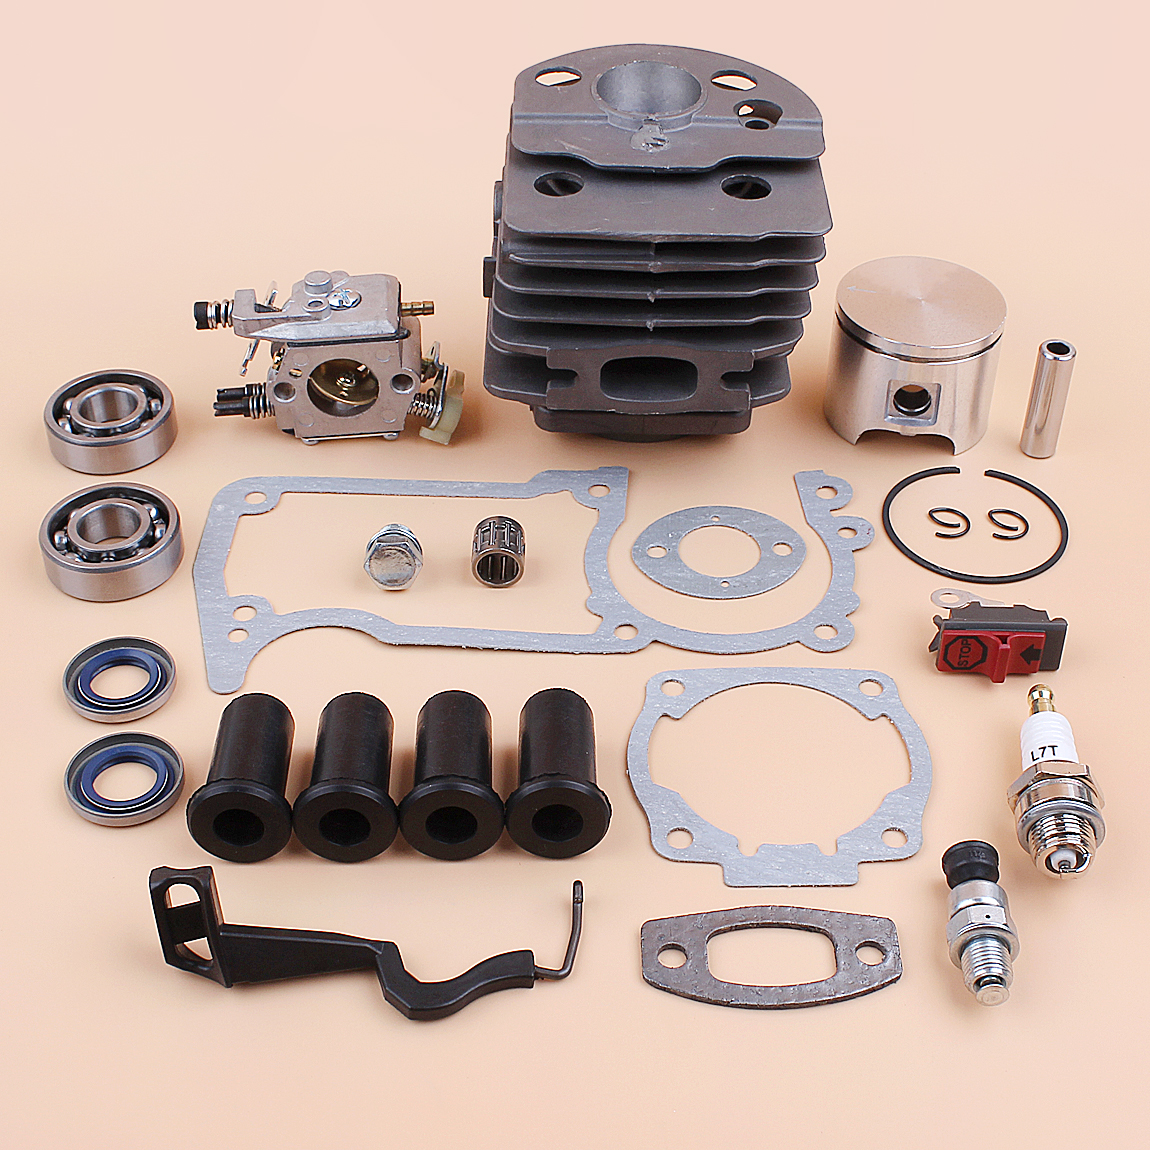 Tools : 46MM Cylinder Piston Carburetor AV Buffer Choke Rod Gaskets Kit For Husqvarna 55 51 Chainsaw Compression Release Value Plug